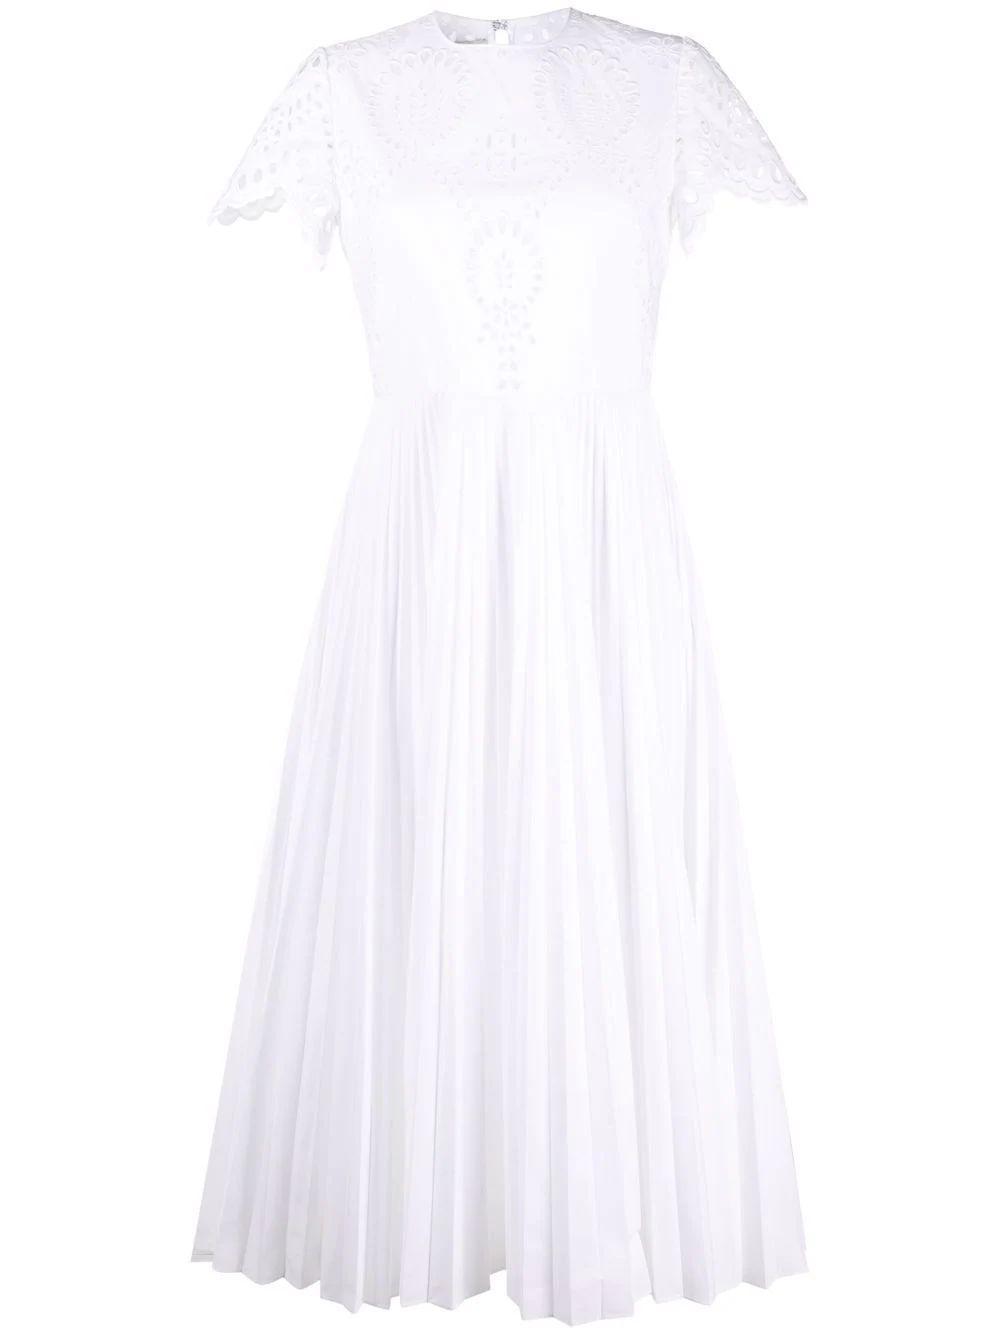 Pleated Eyelet Midi Dress Item # WB3VAWG06HB